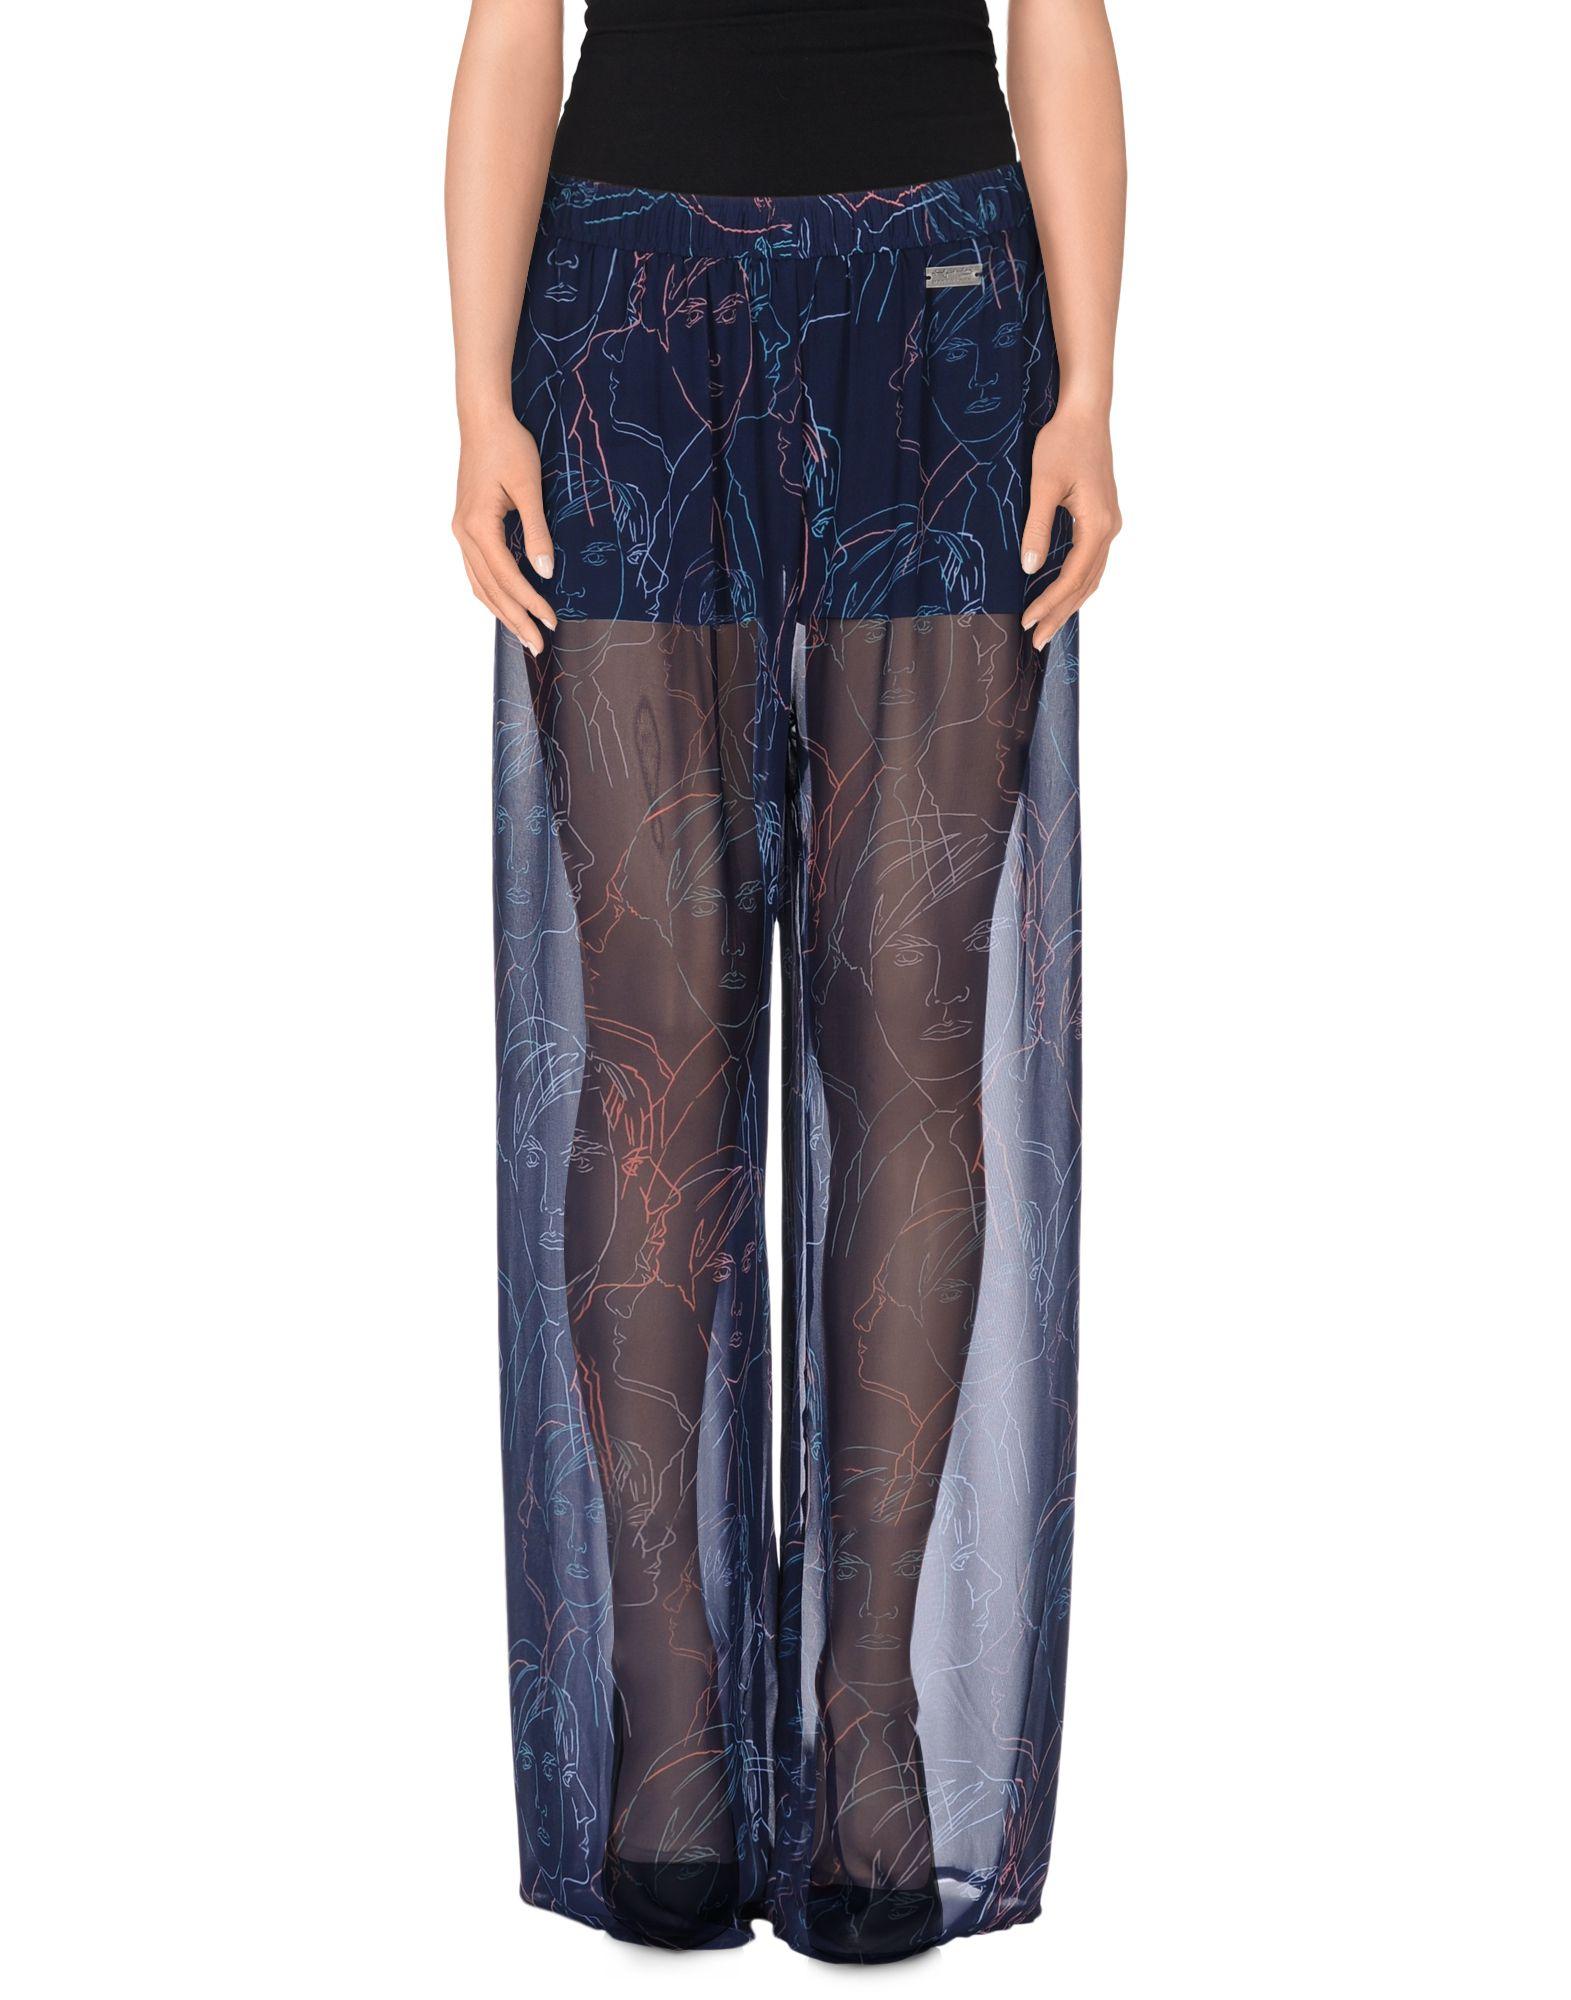 ANDY WARHOL by PEPE JEANS Повседневные брюки цены онлайн